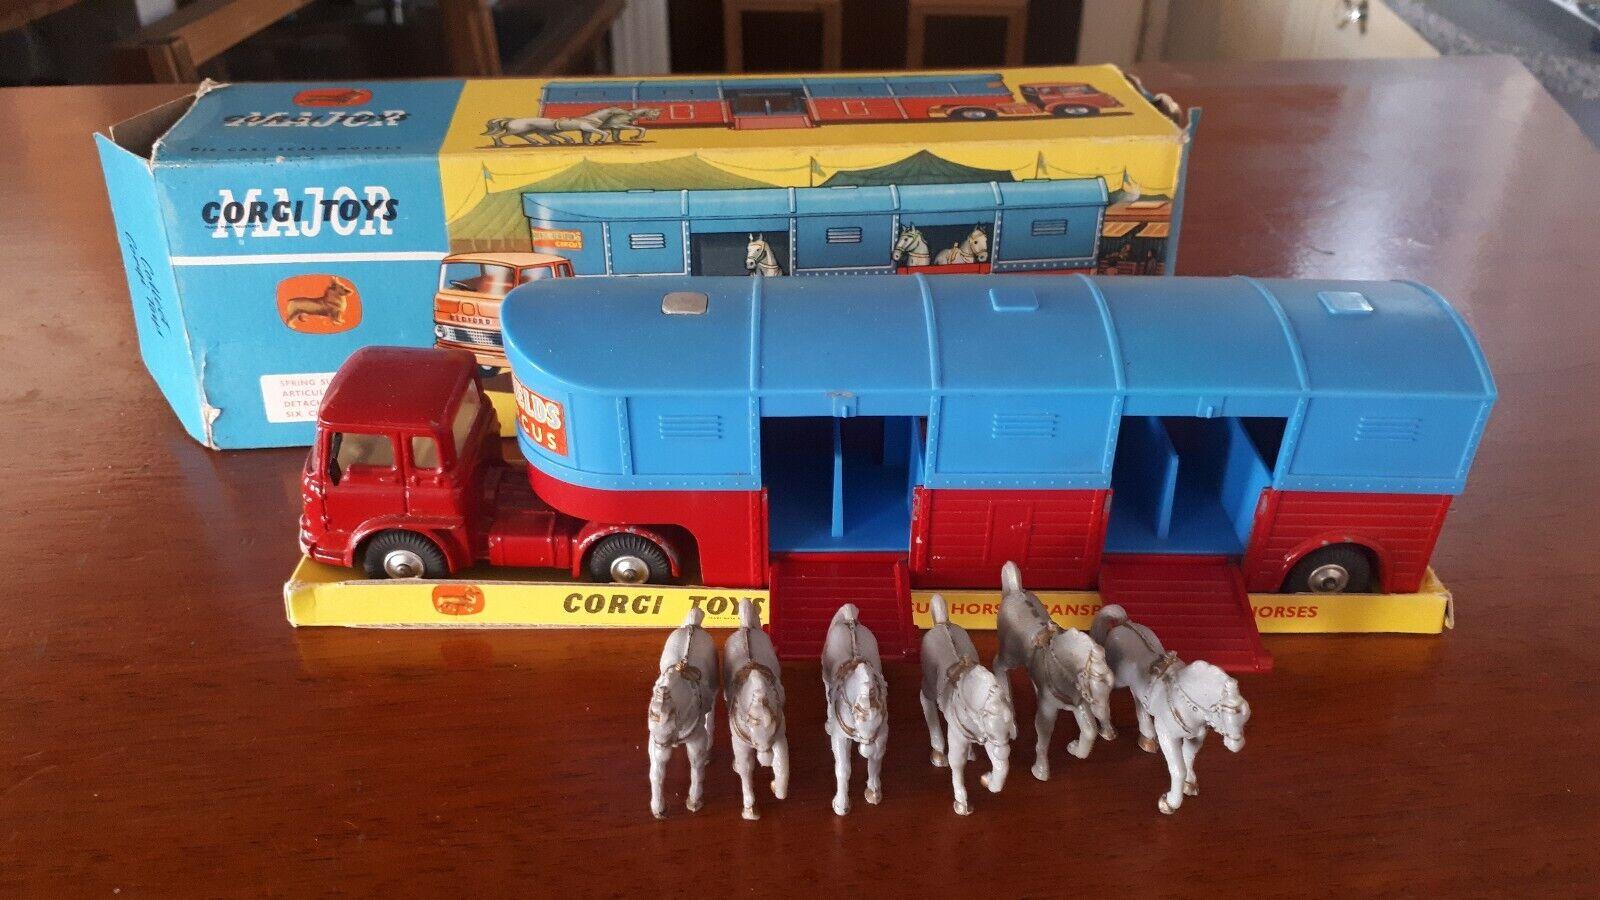 CORGI 1130 circus horse transporter with horses Boxed